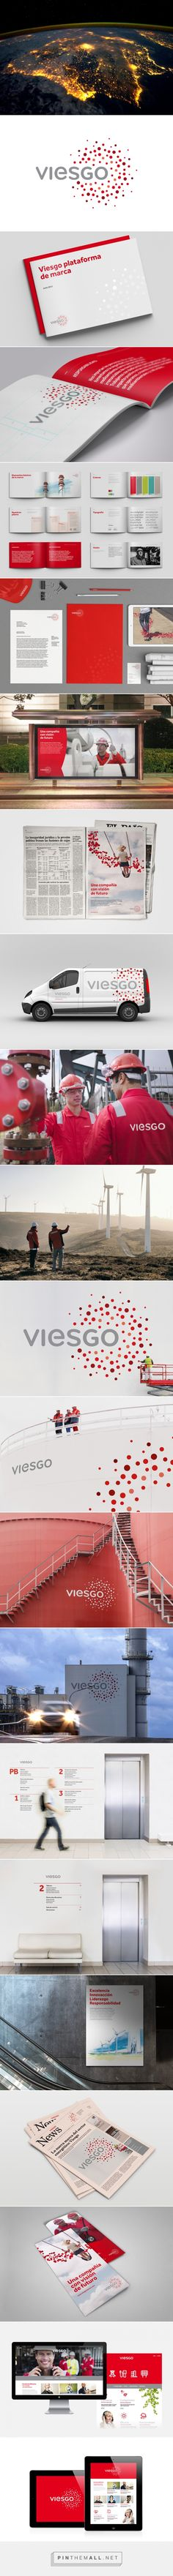 Erretres | Viesgo - created via http://pinthemall.net